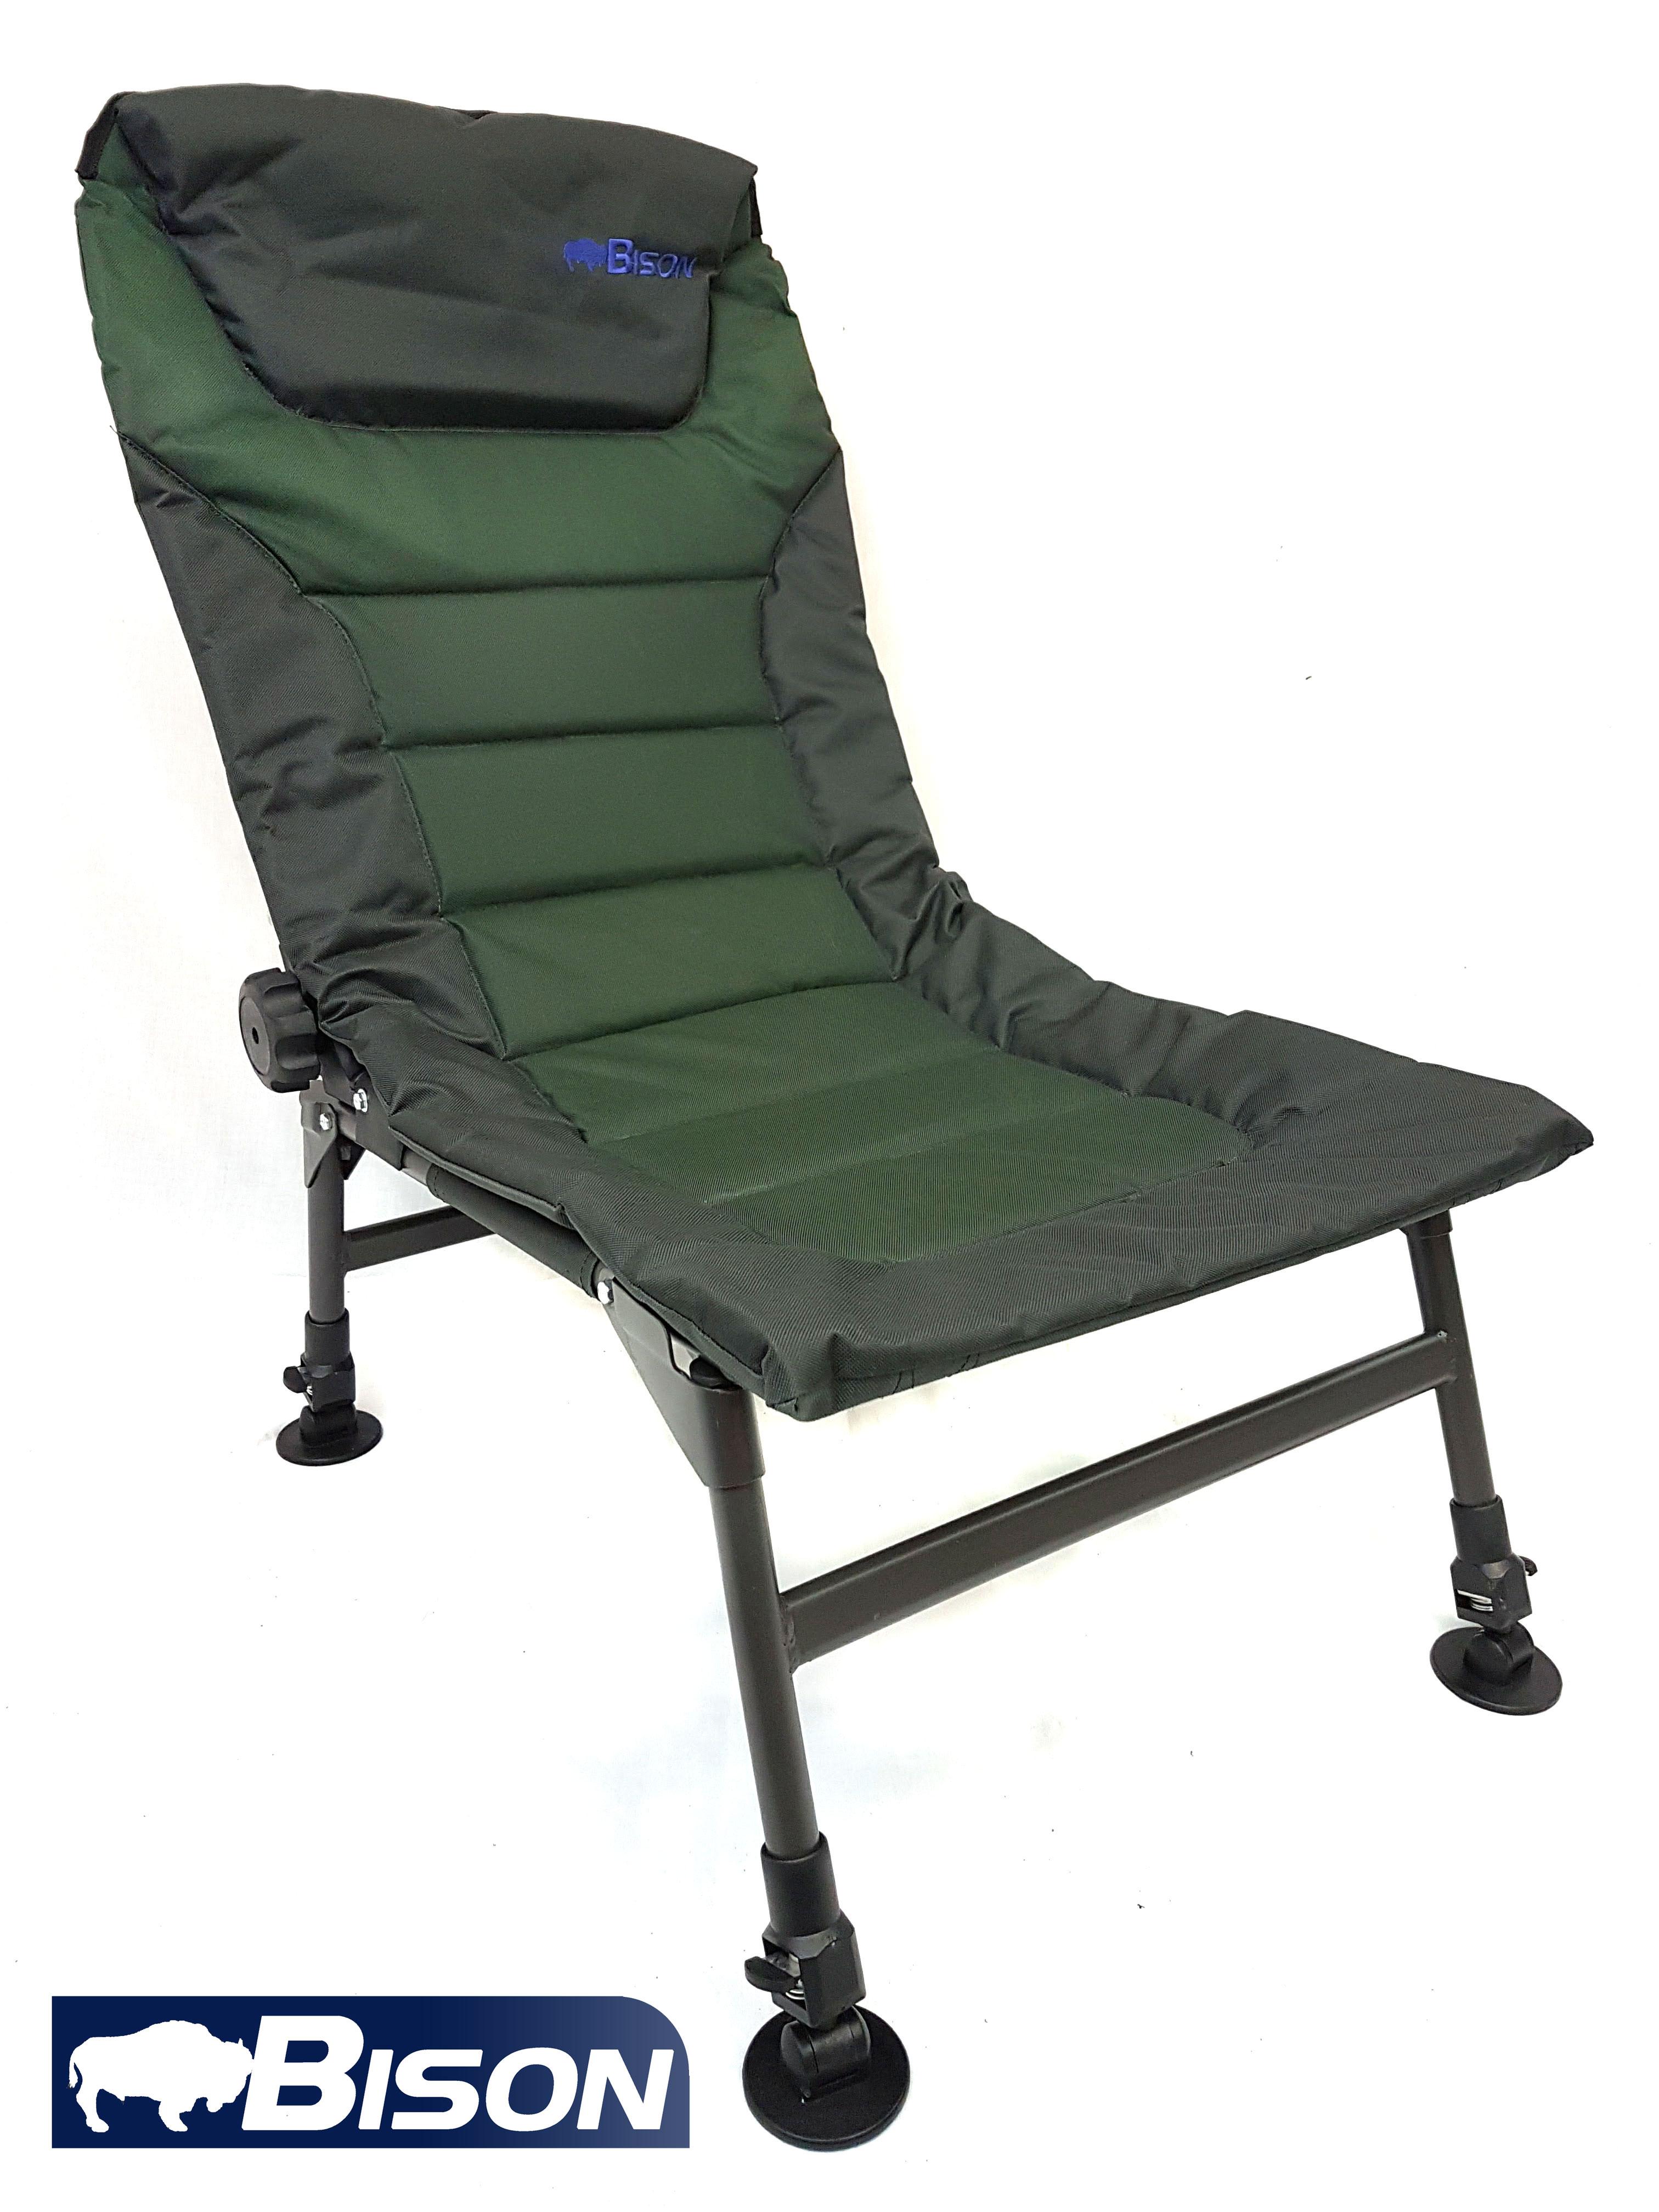 Bison Carp Fishing Chair Ebay